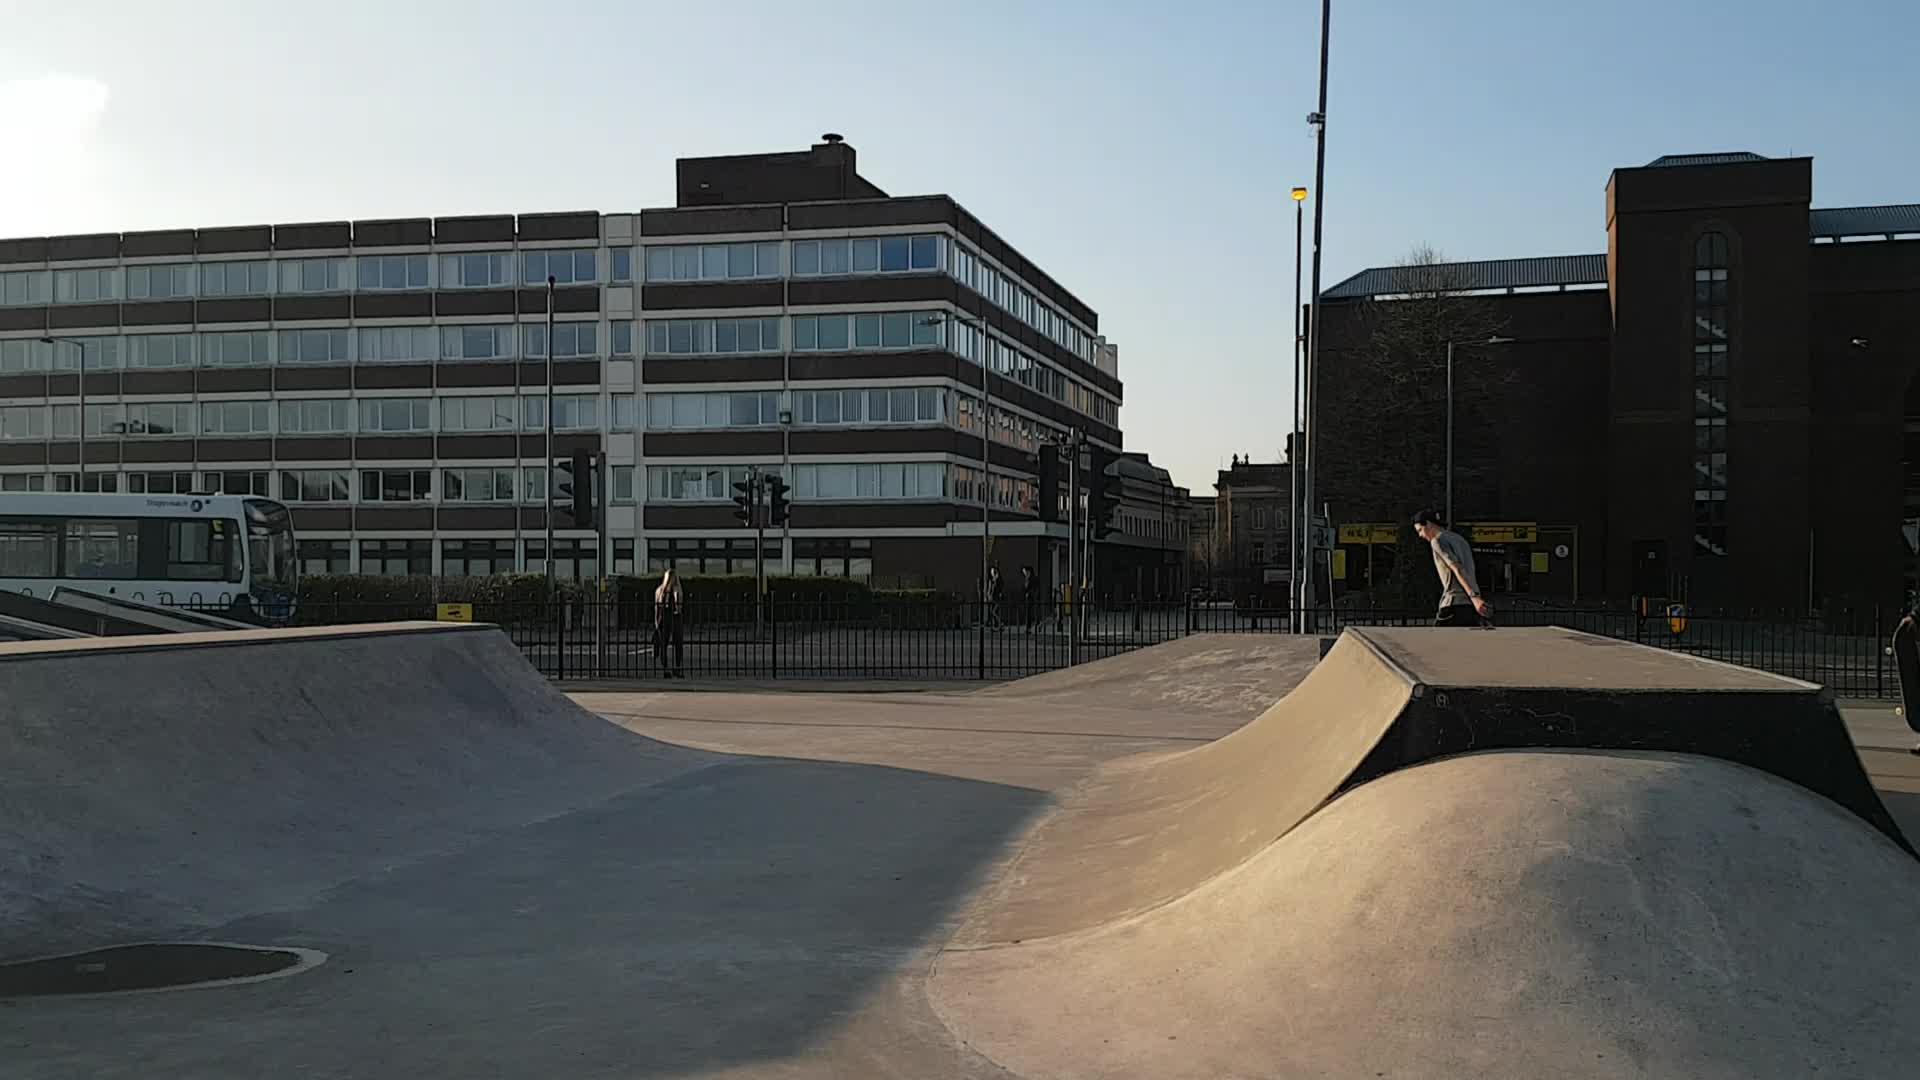 blading, high quality gifs, rollerblading, ttp, Erik Richardson - TTP (Bolton Skate park) GIFs